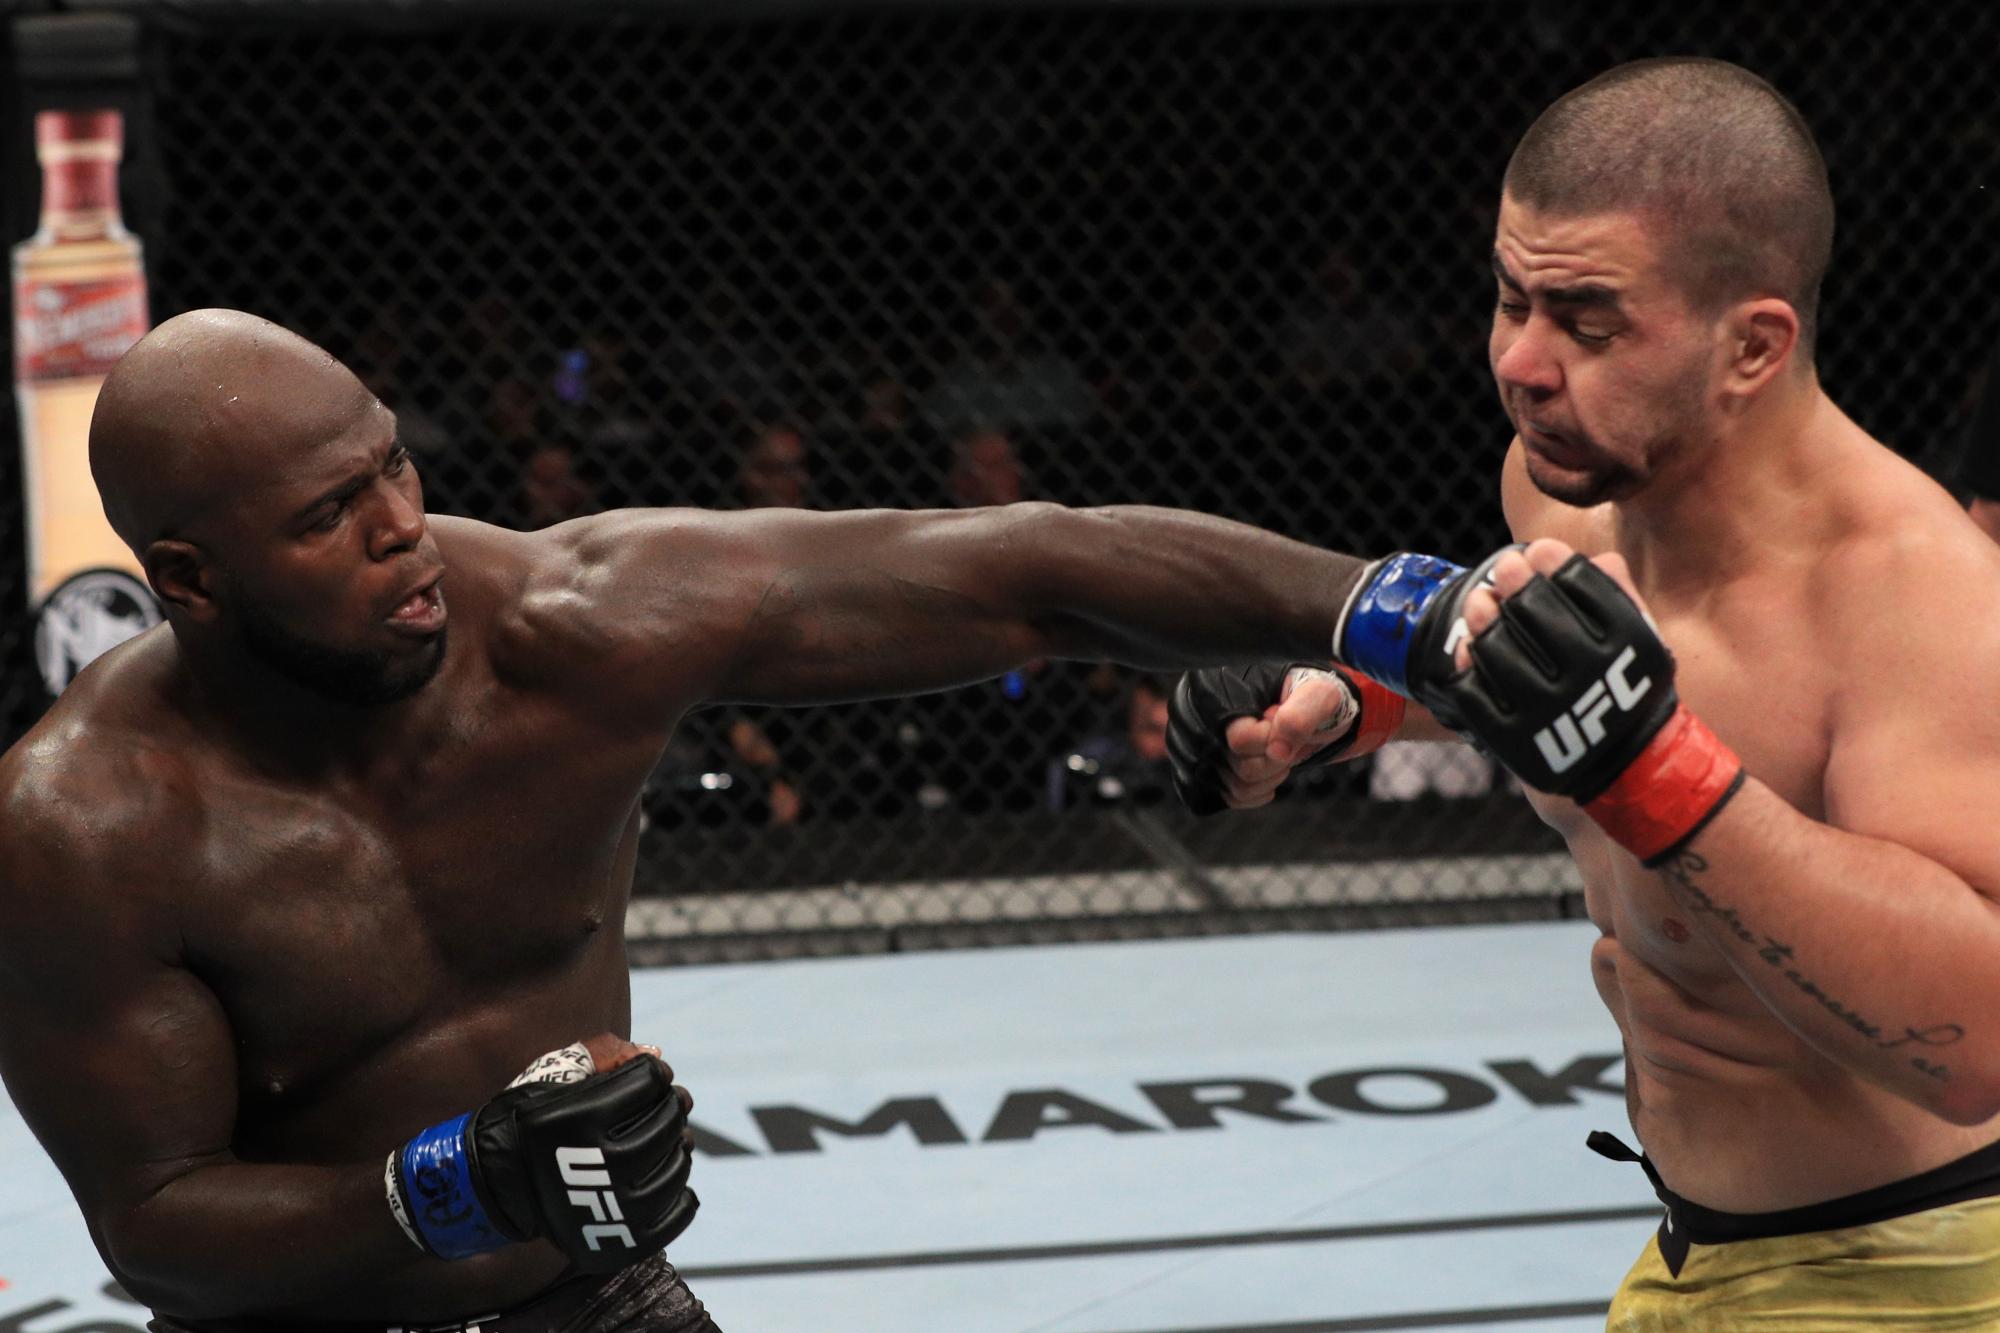 New Phase of Life Has Begun For Jairzinho Rozenstruik | UFC